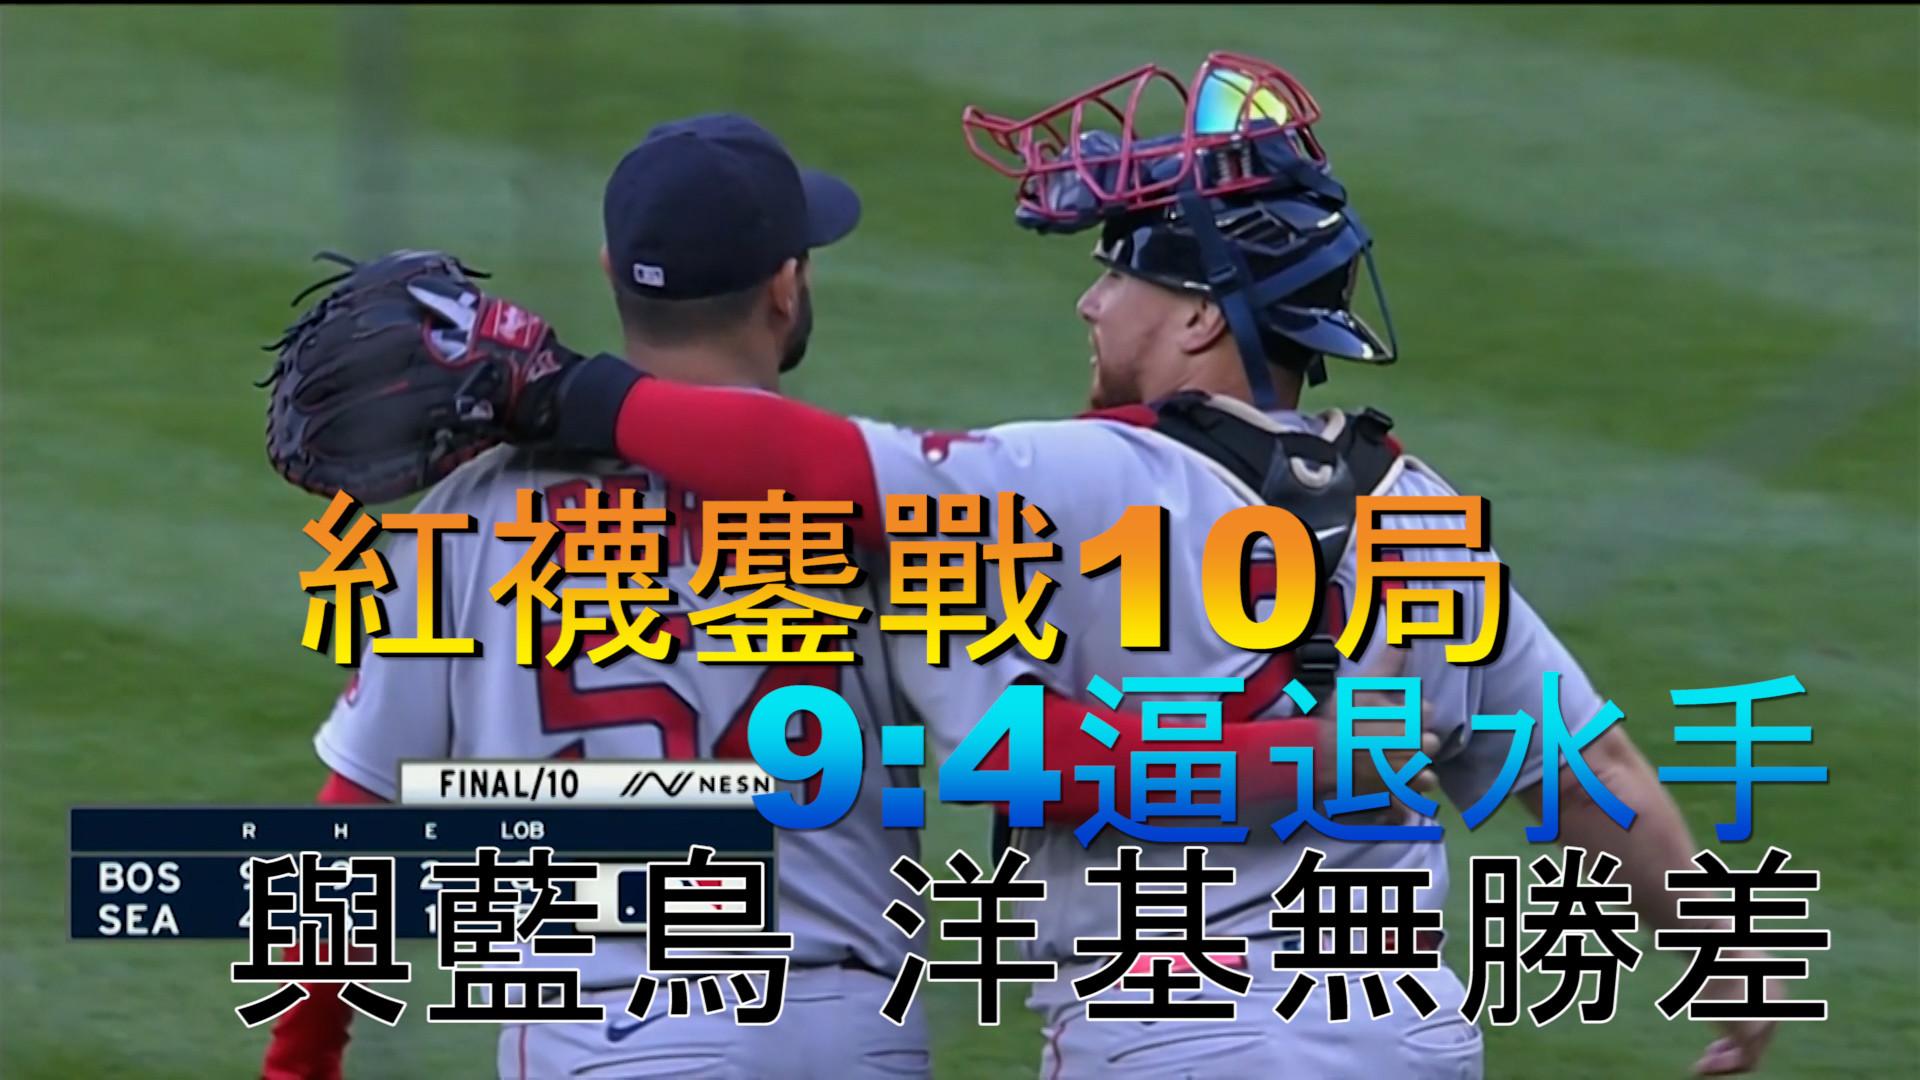 【MLB看愛爾達】紅襪延長10局得6分 9:4逼退水手  9/16